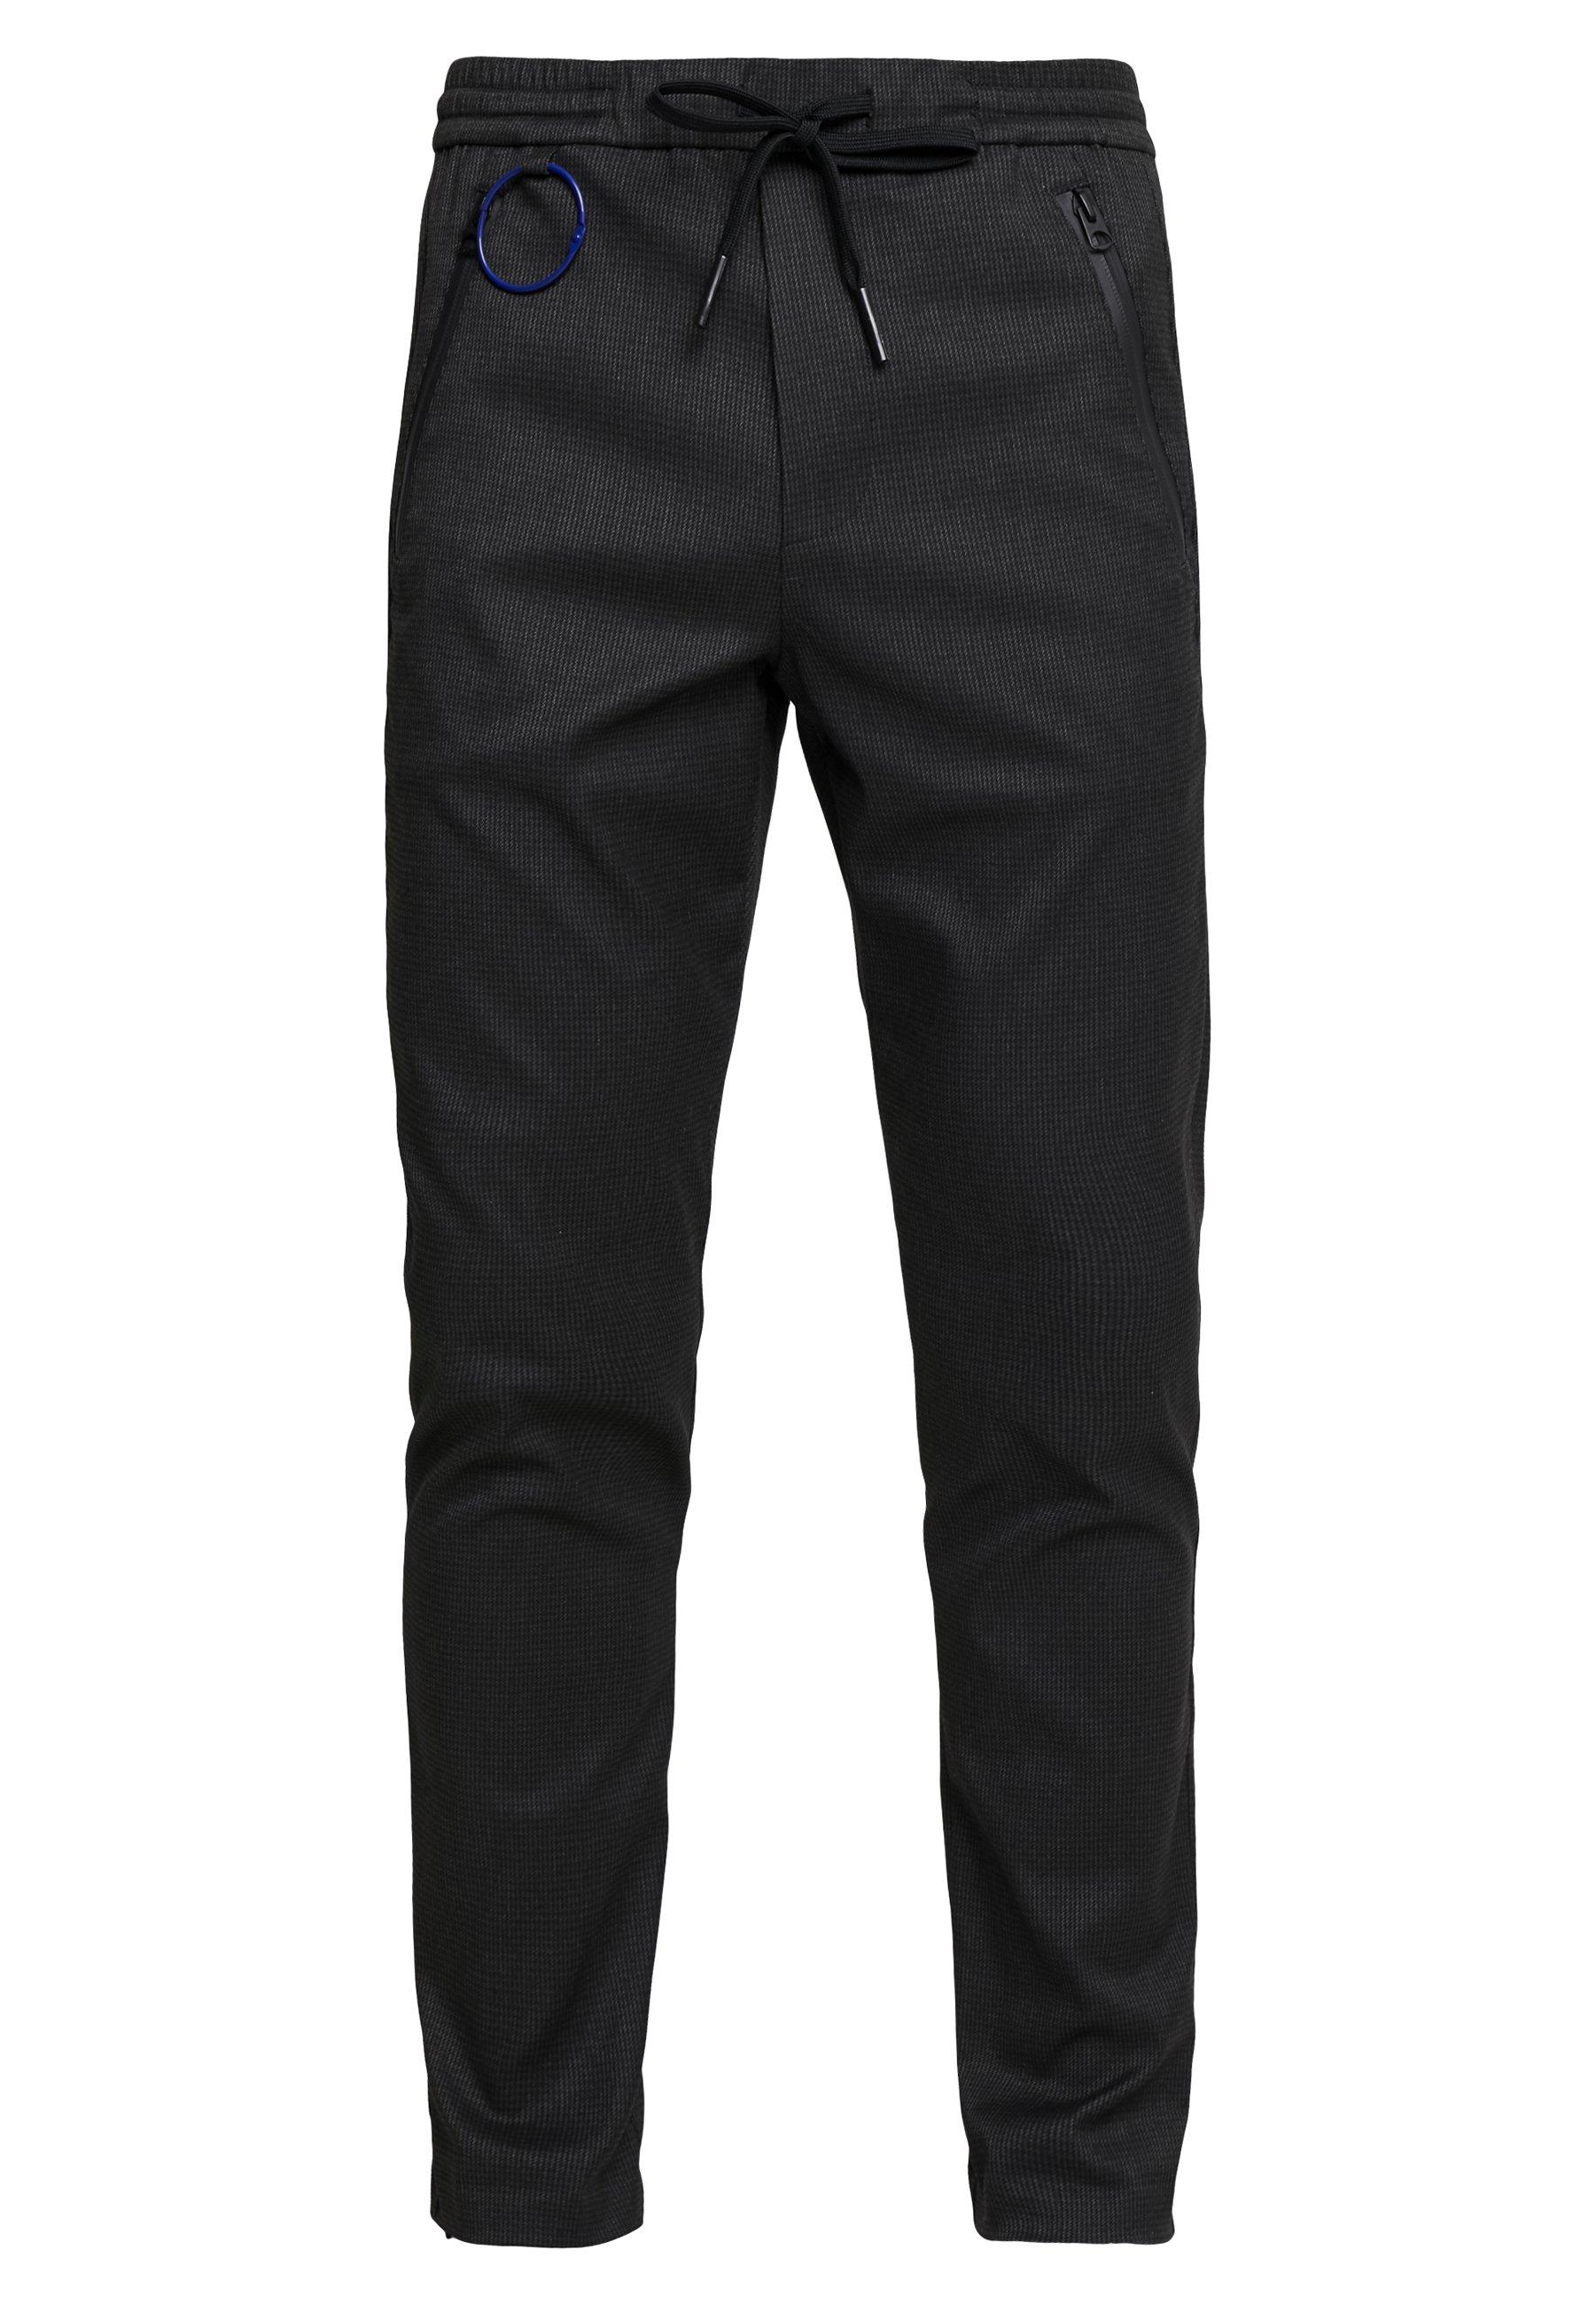 Replay Pantalon classique - black/military